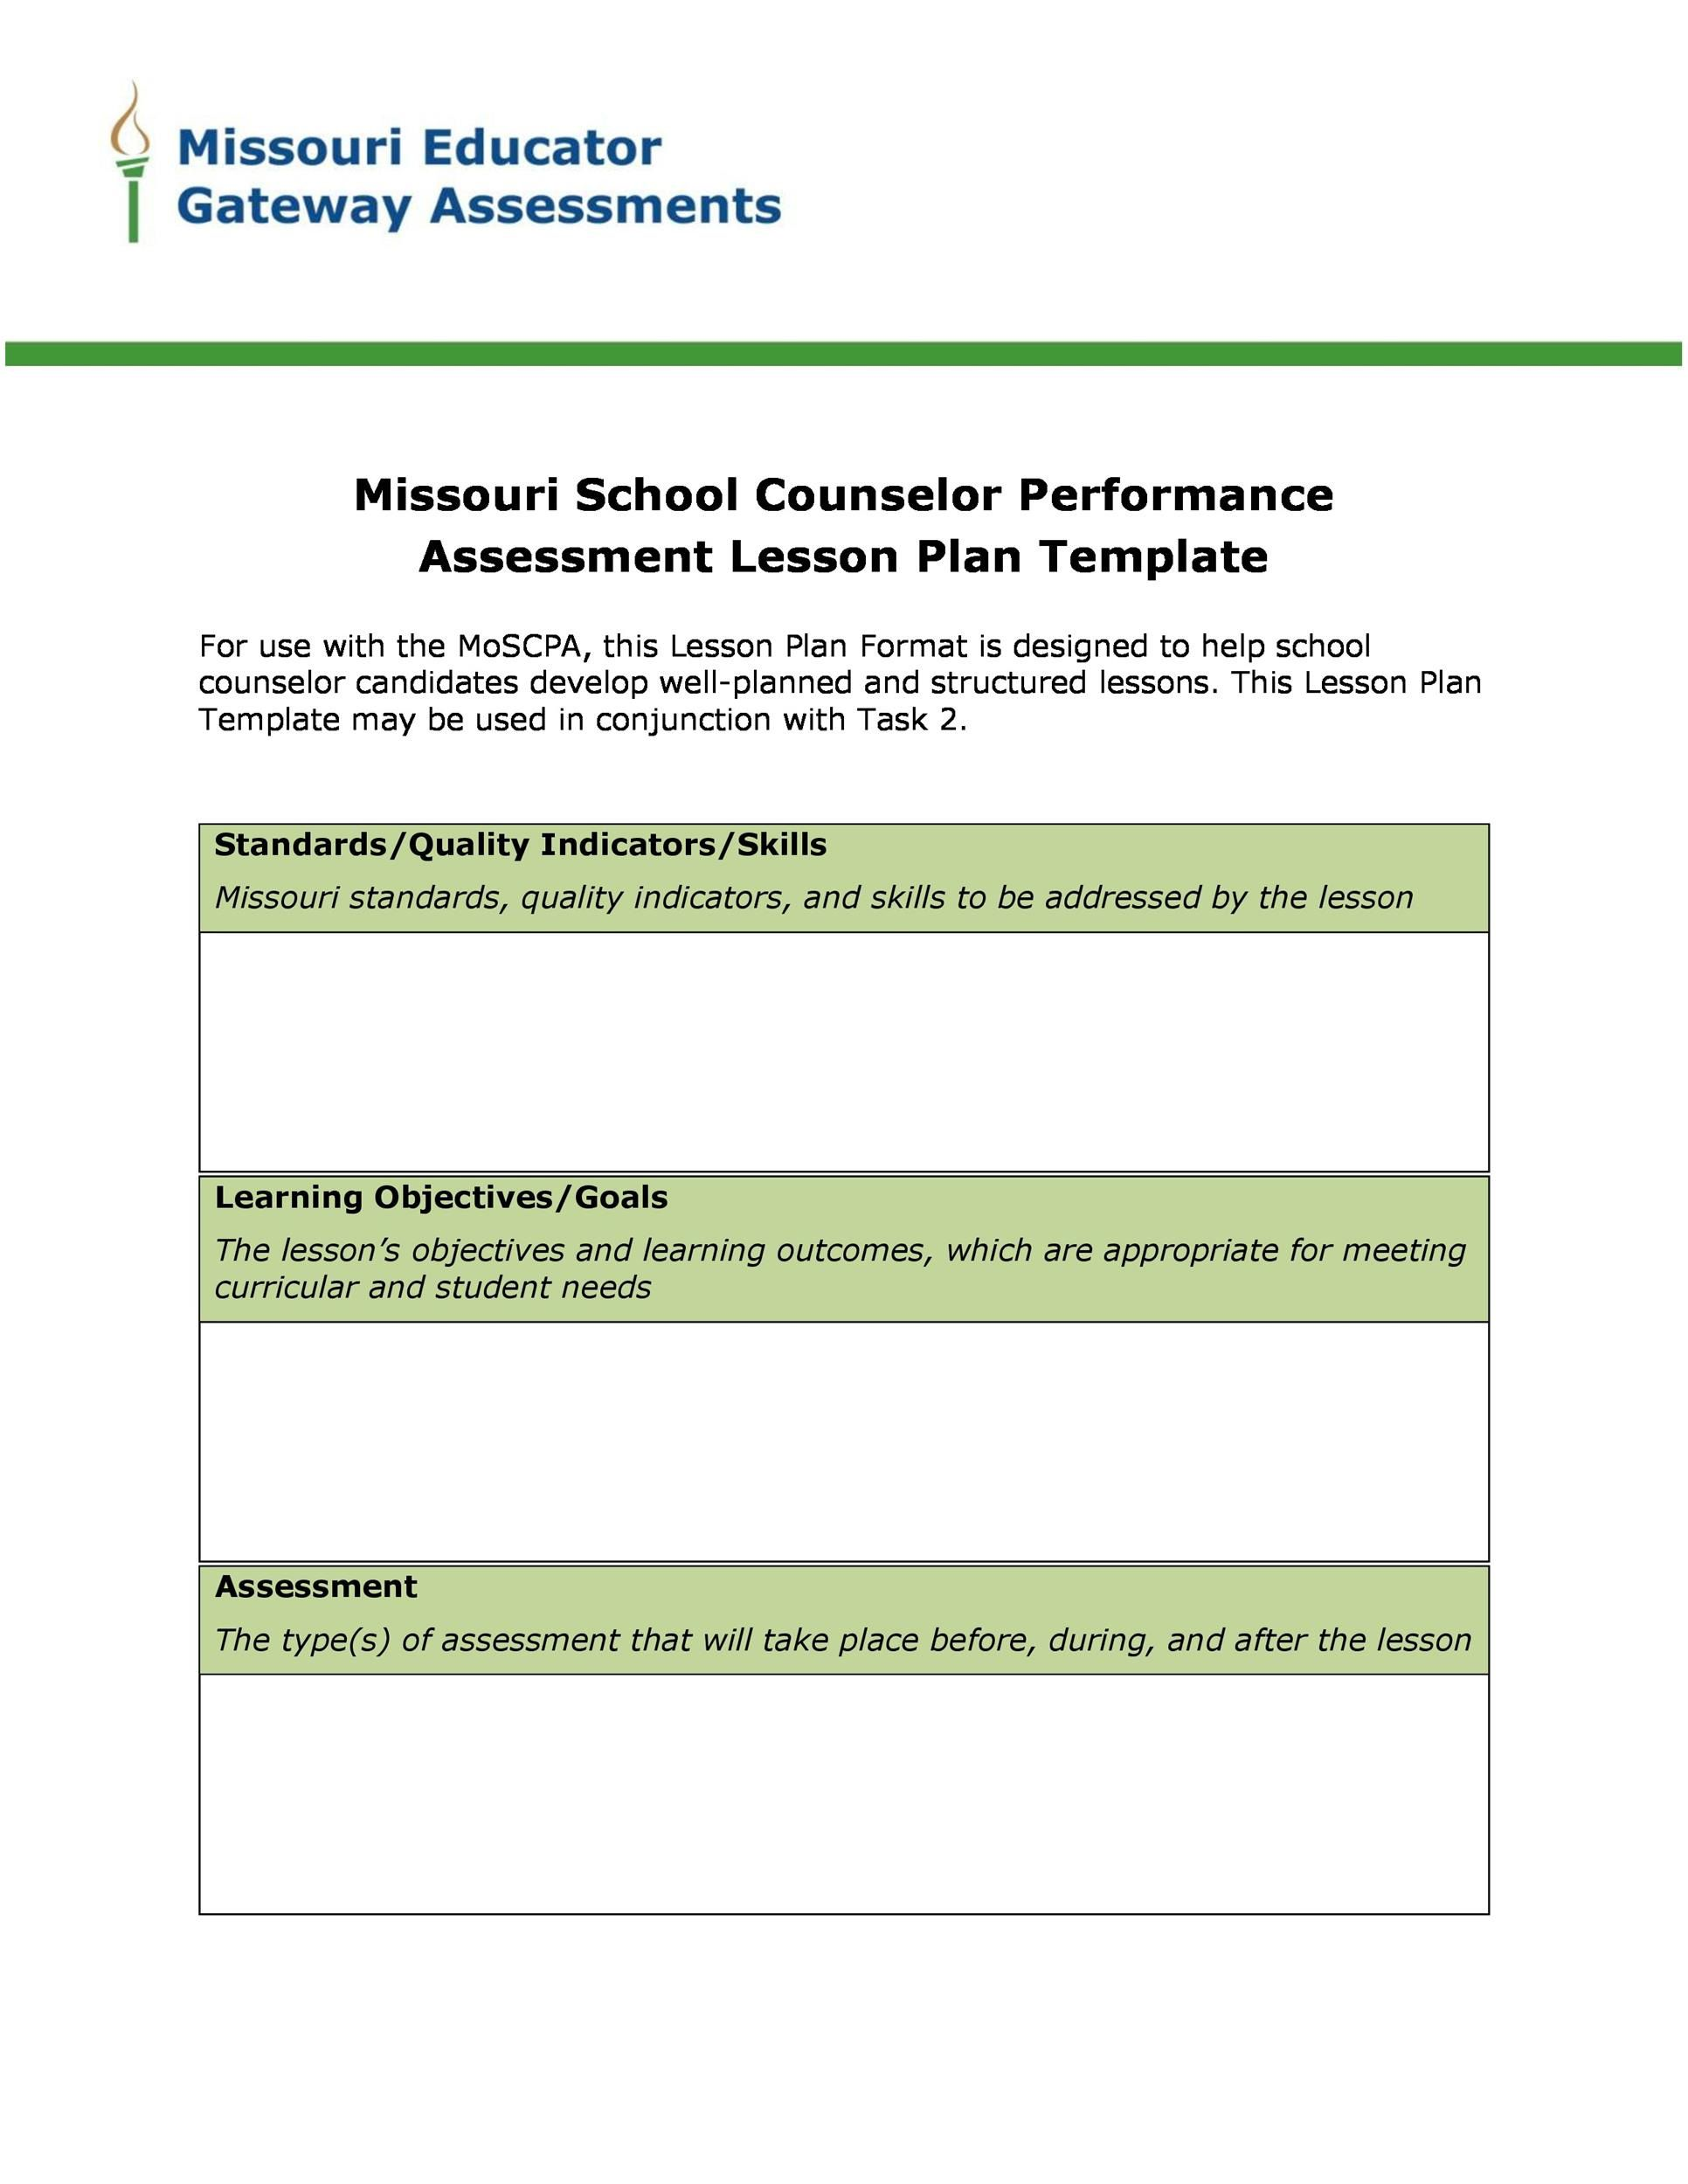 004 Astounding Weekly Lesson Plan Template Editable High Resolution  Google Doc Preschool Downloadable FreeFull